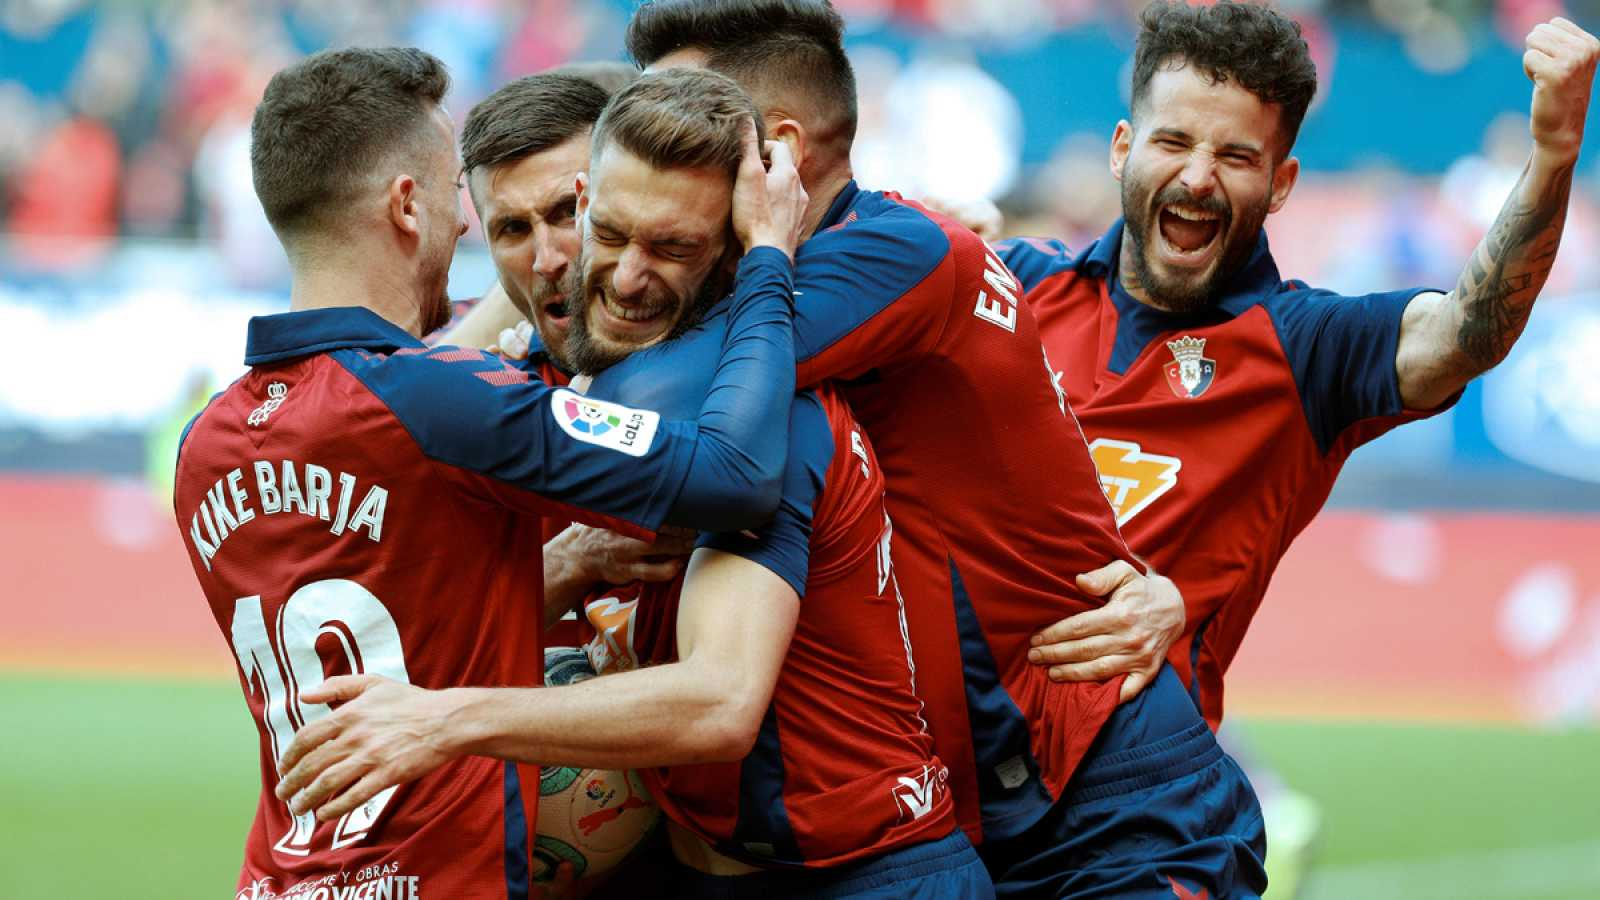 Jugadores de Osasuna celebran el gol